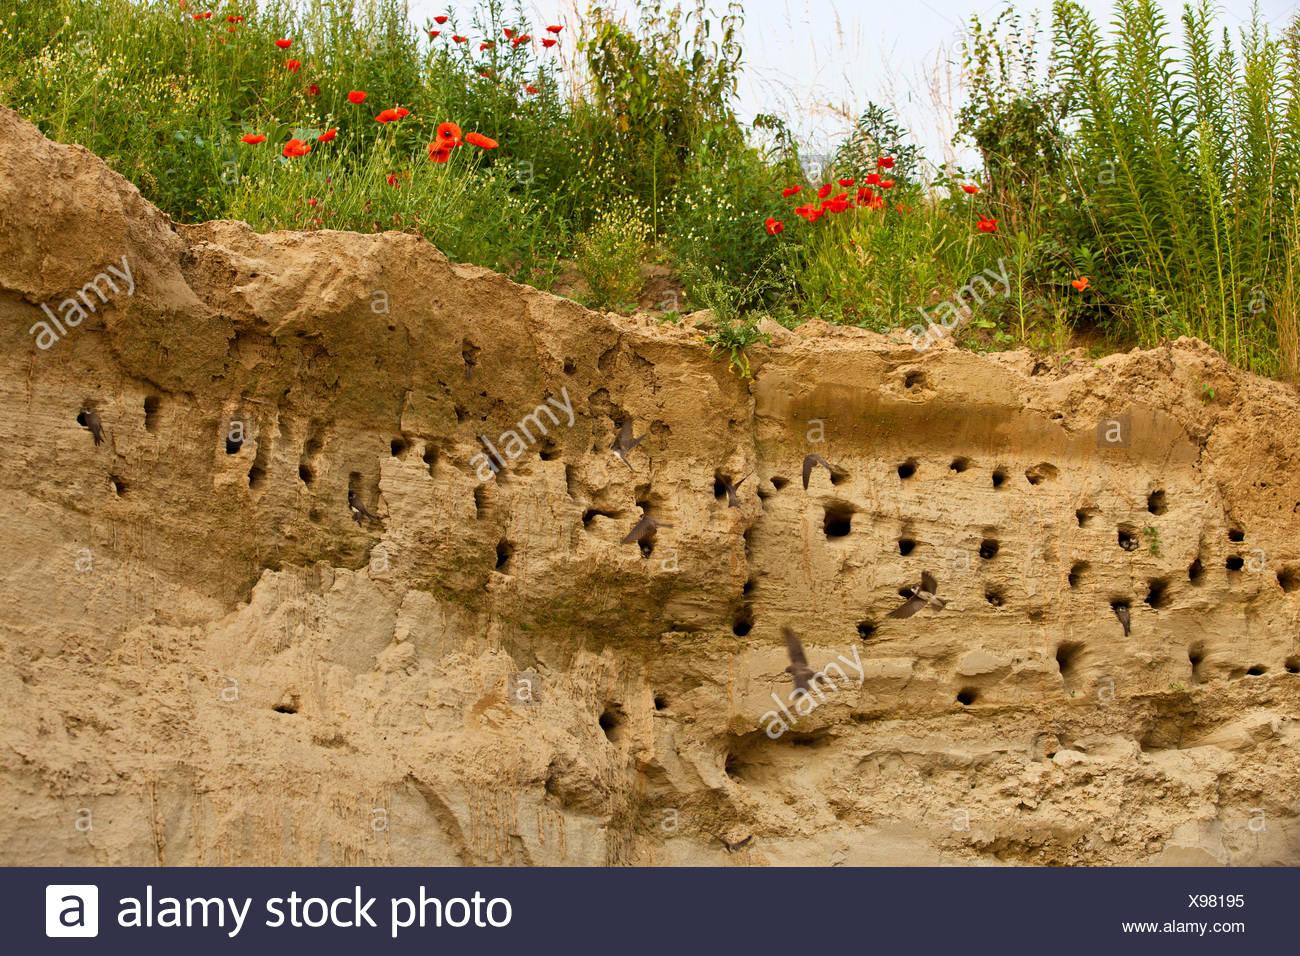 sand martin (Riparia riparia), breeding colony, Germany, Bavaria, Isental - Stock Image